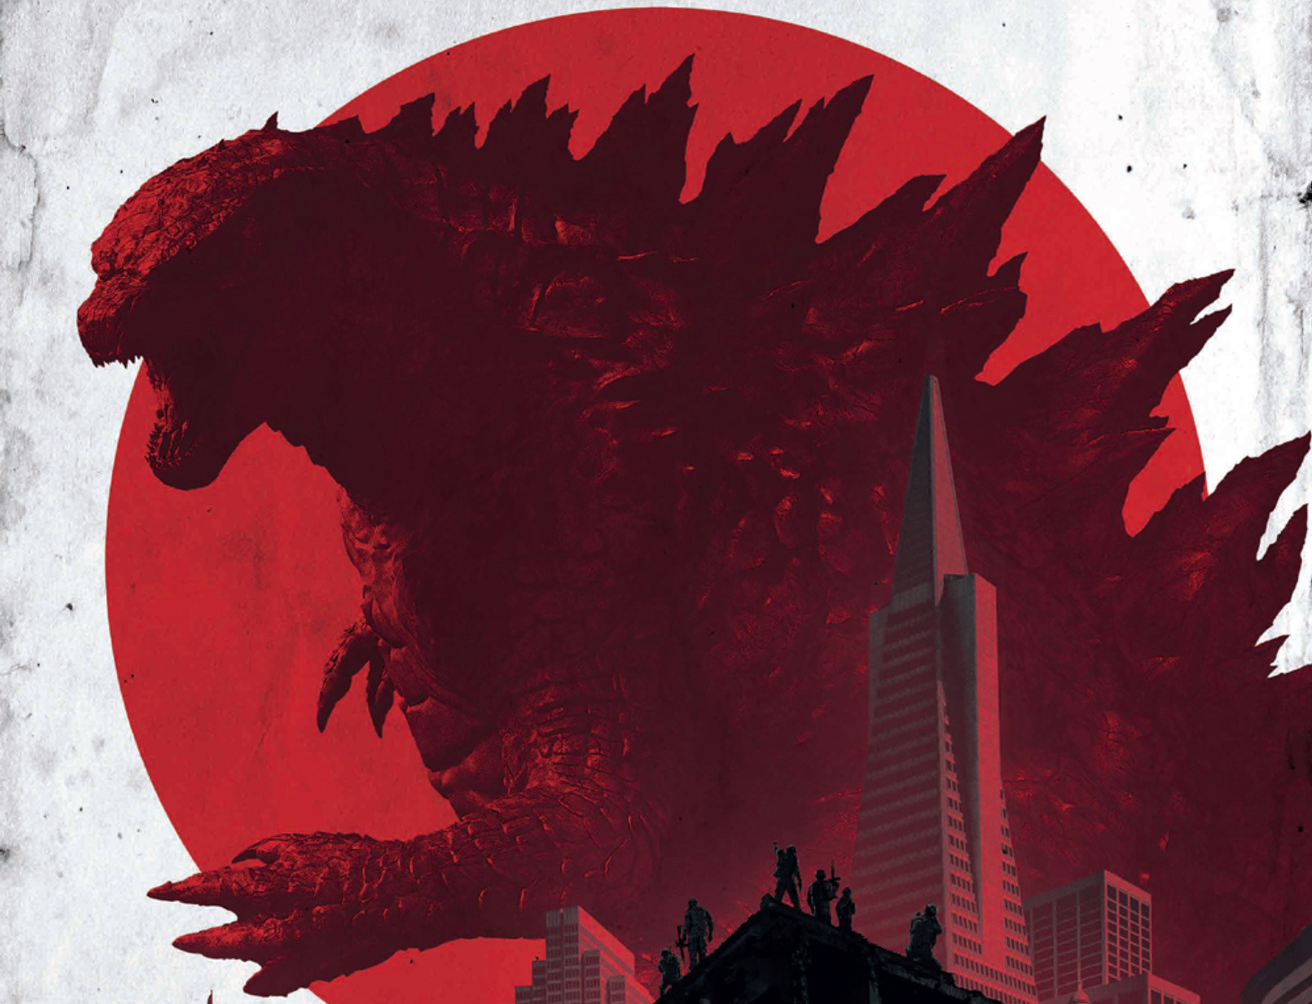 Godzilla Anime Movie Set for 2017